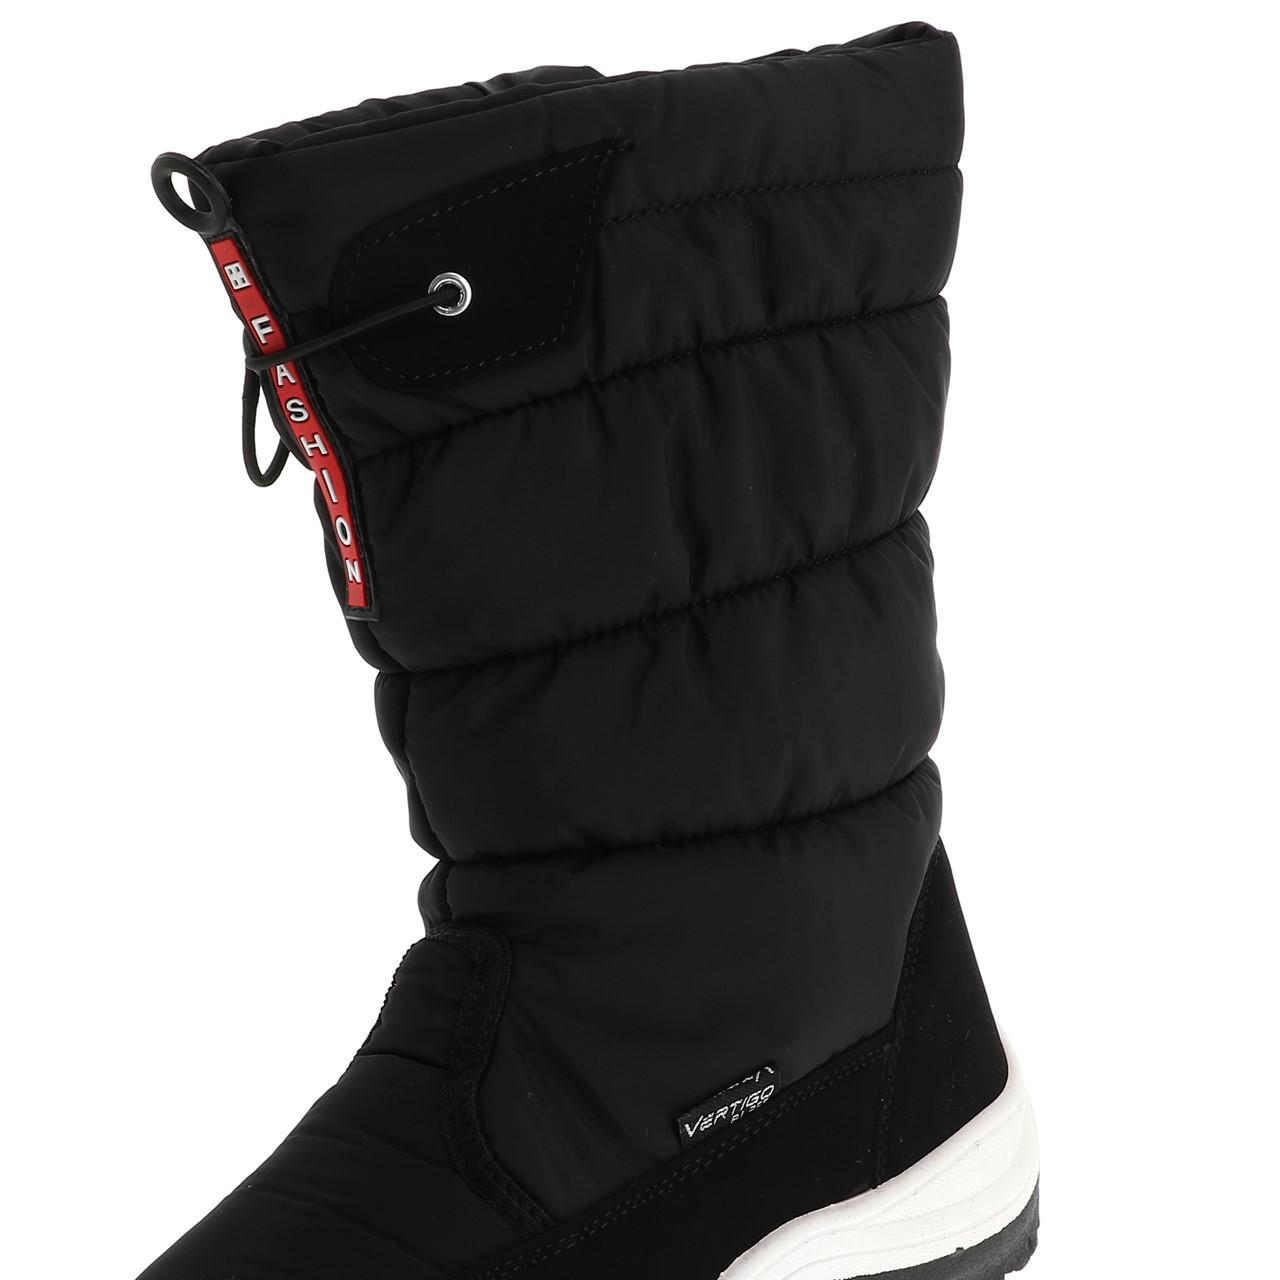 Bottes-neige-apres-ski-Alpes-vertigo-Listo-noir-boots-l-Noir-14439-Neuf miniature 2